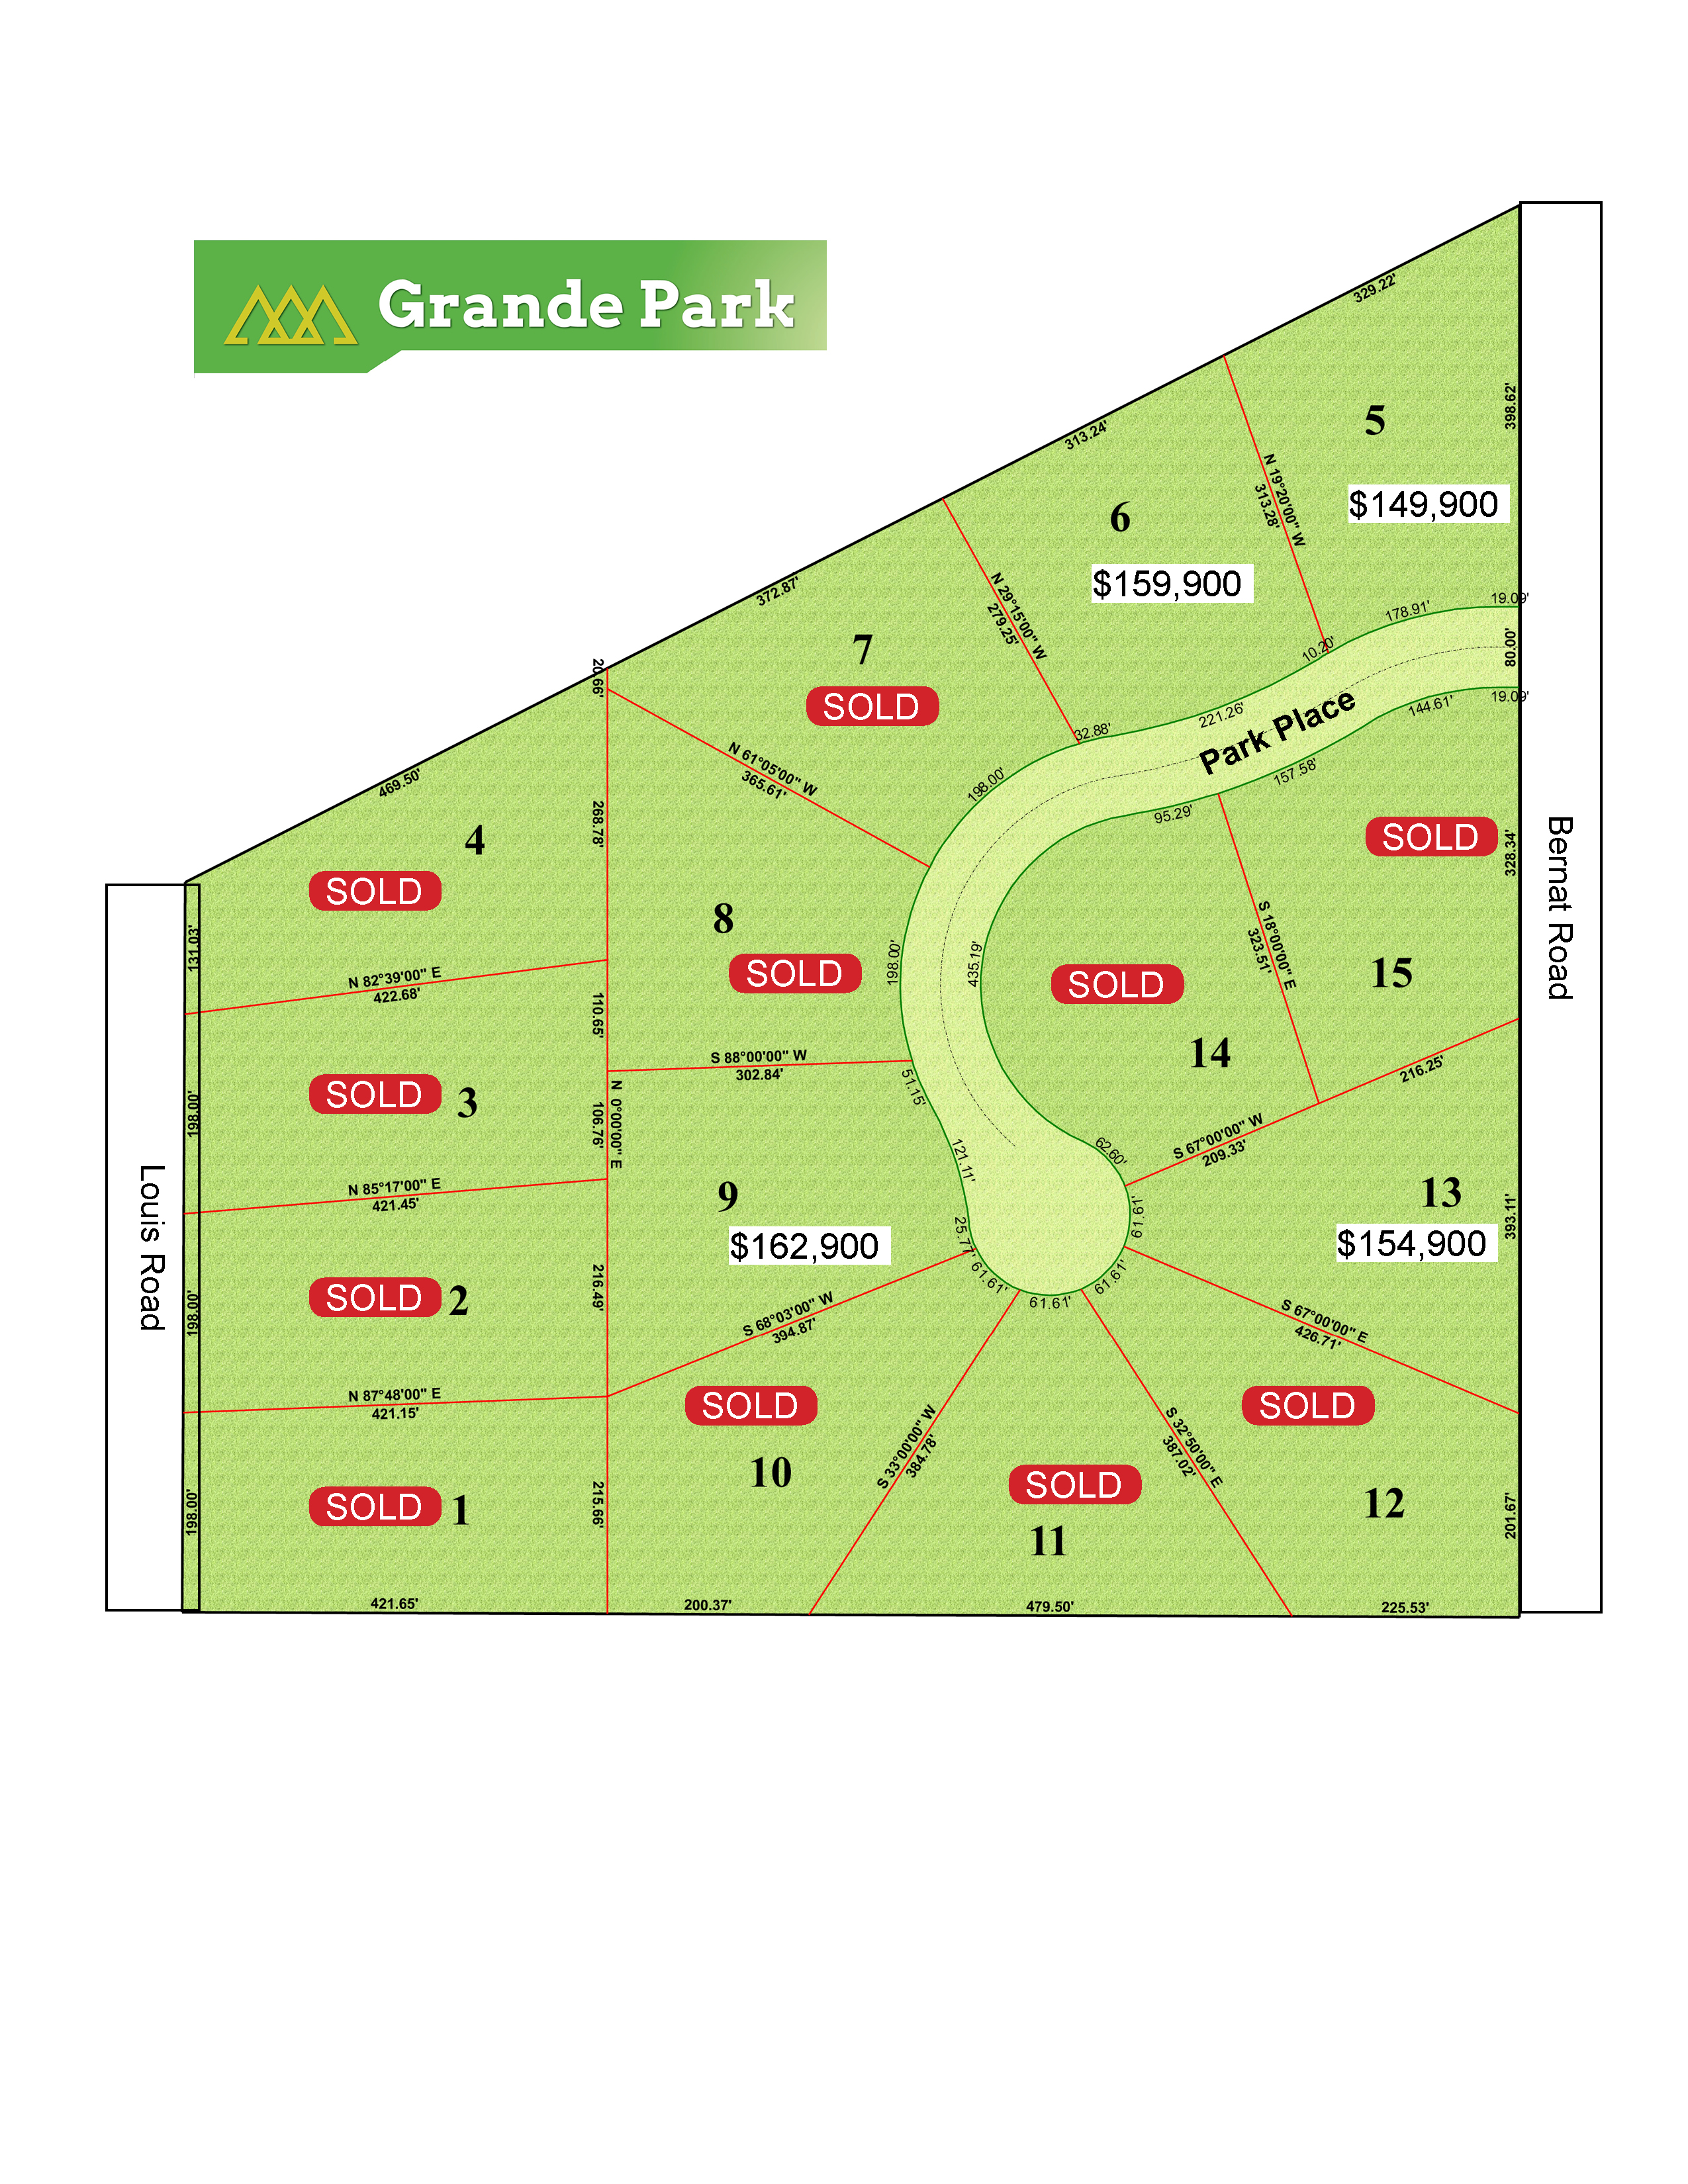 Grande Park Development Site Map